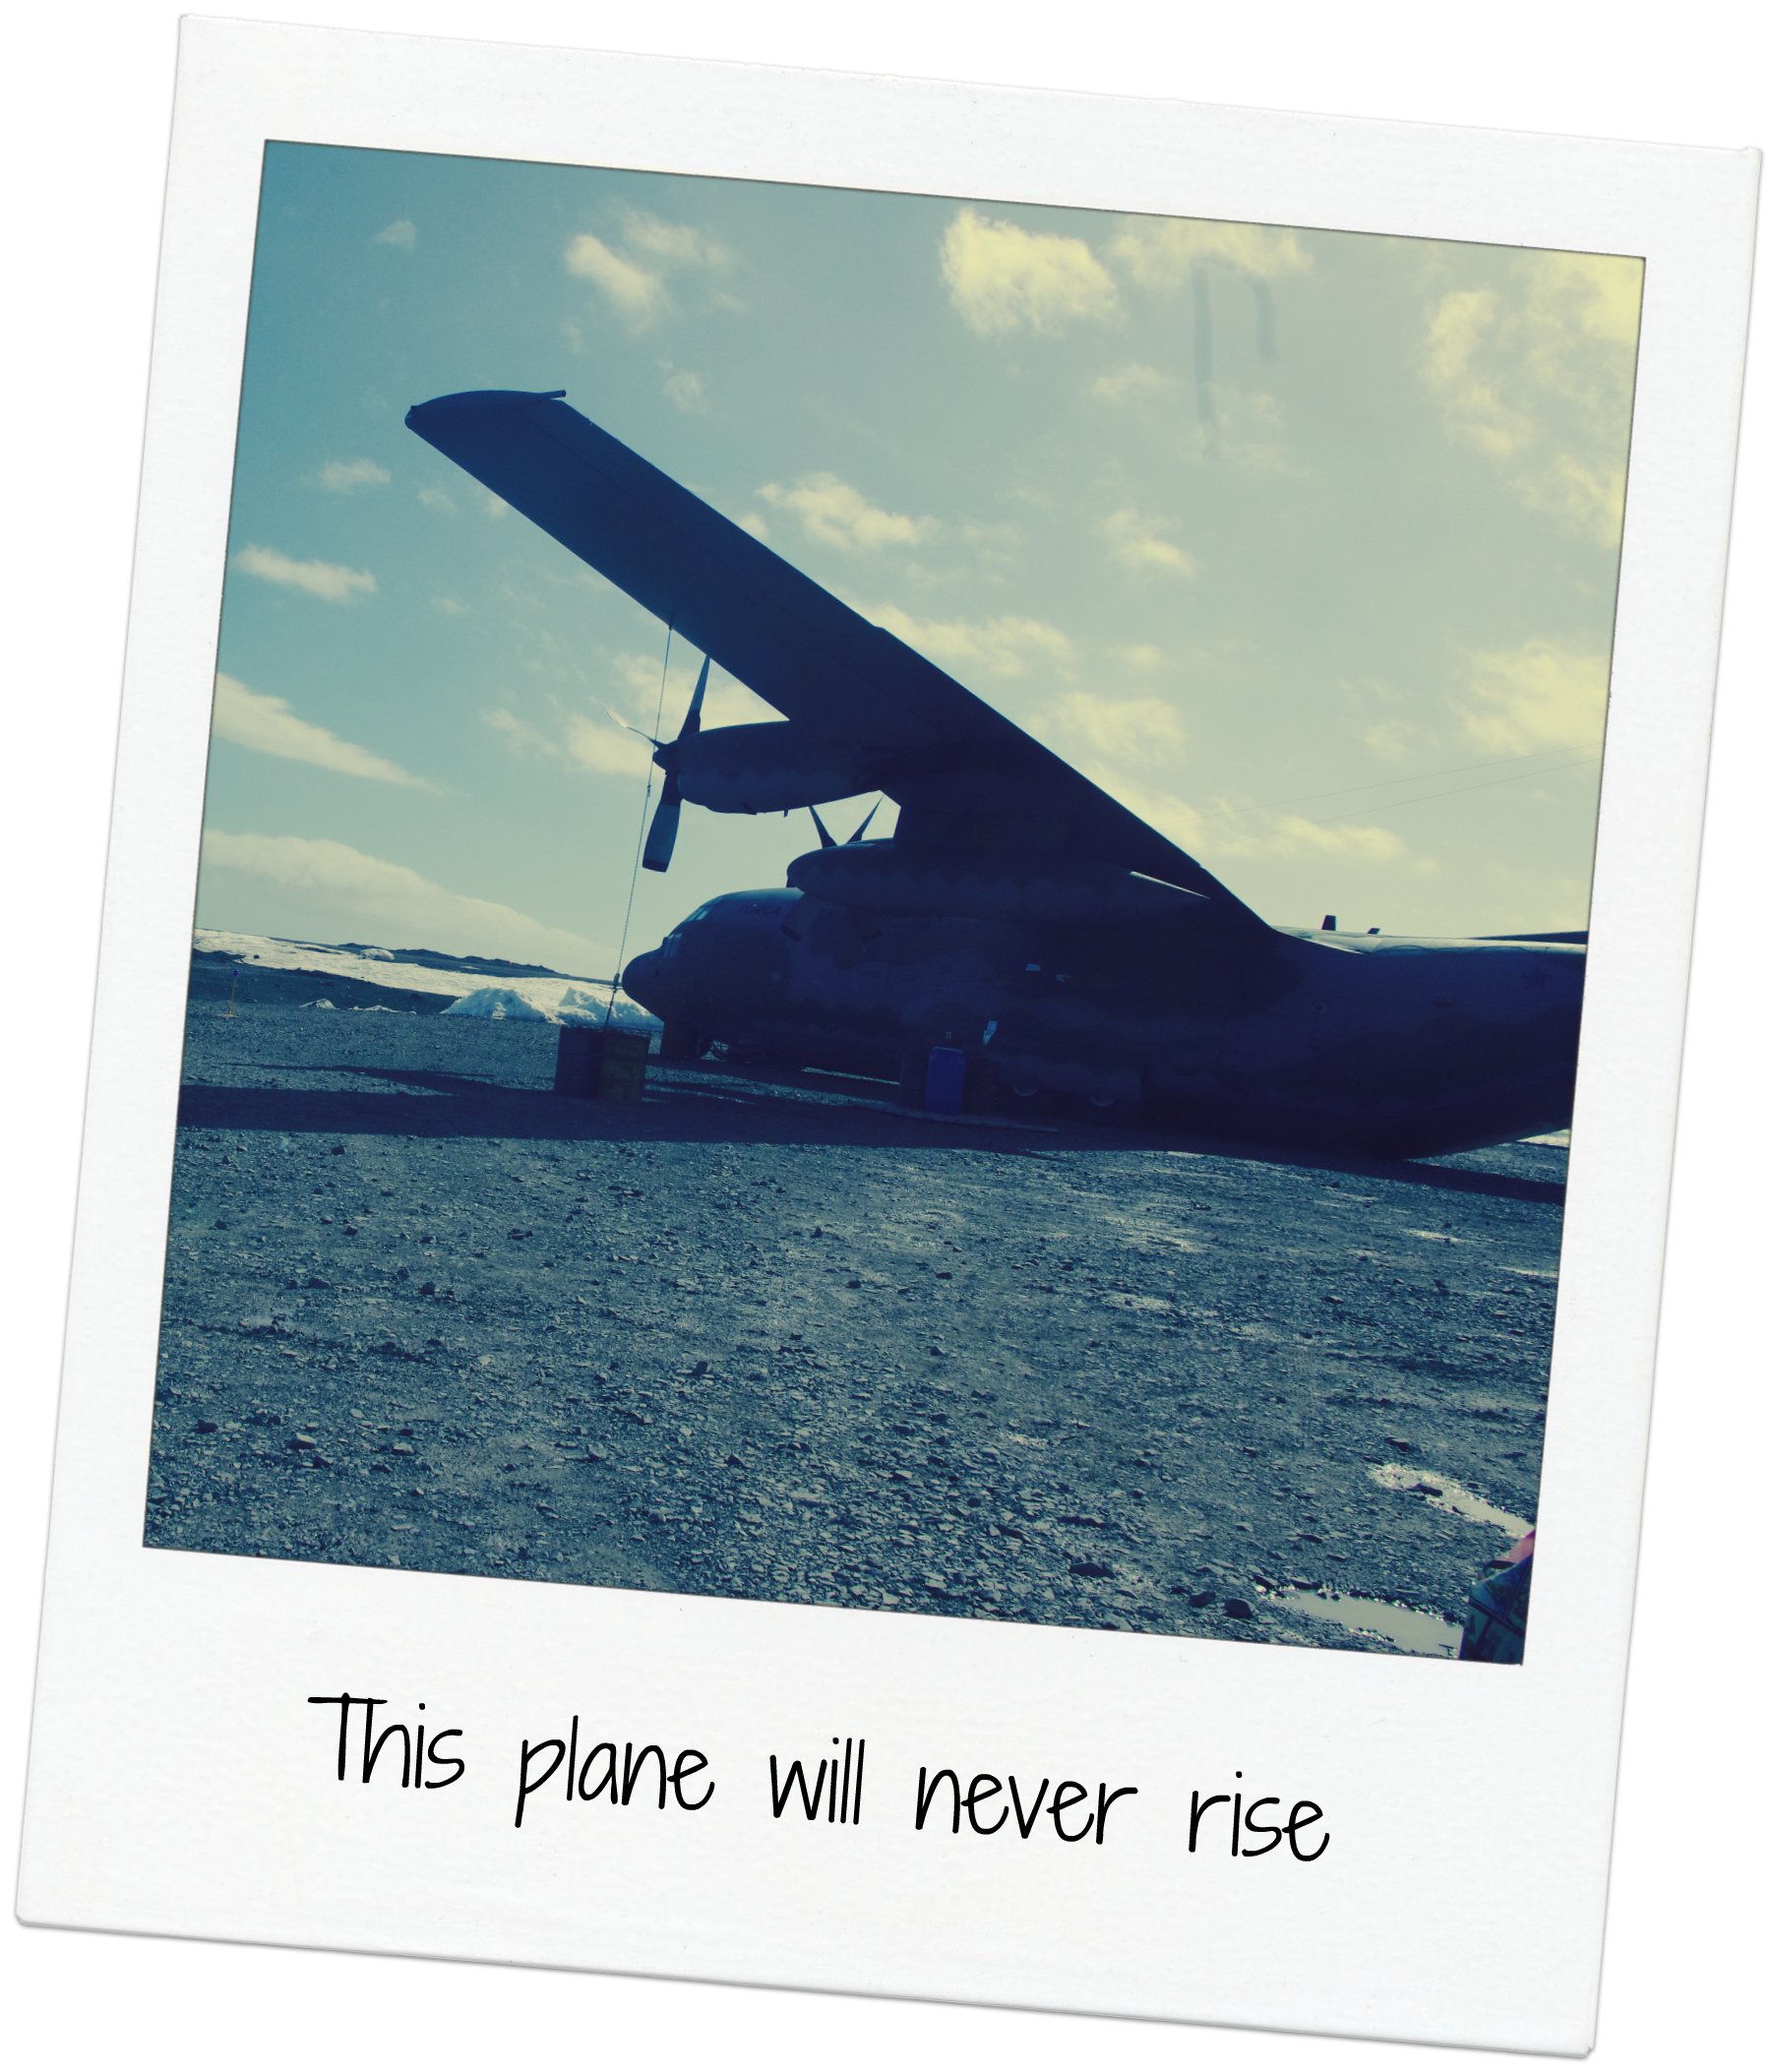 plane on king george island